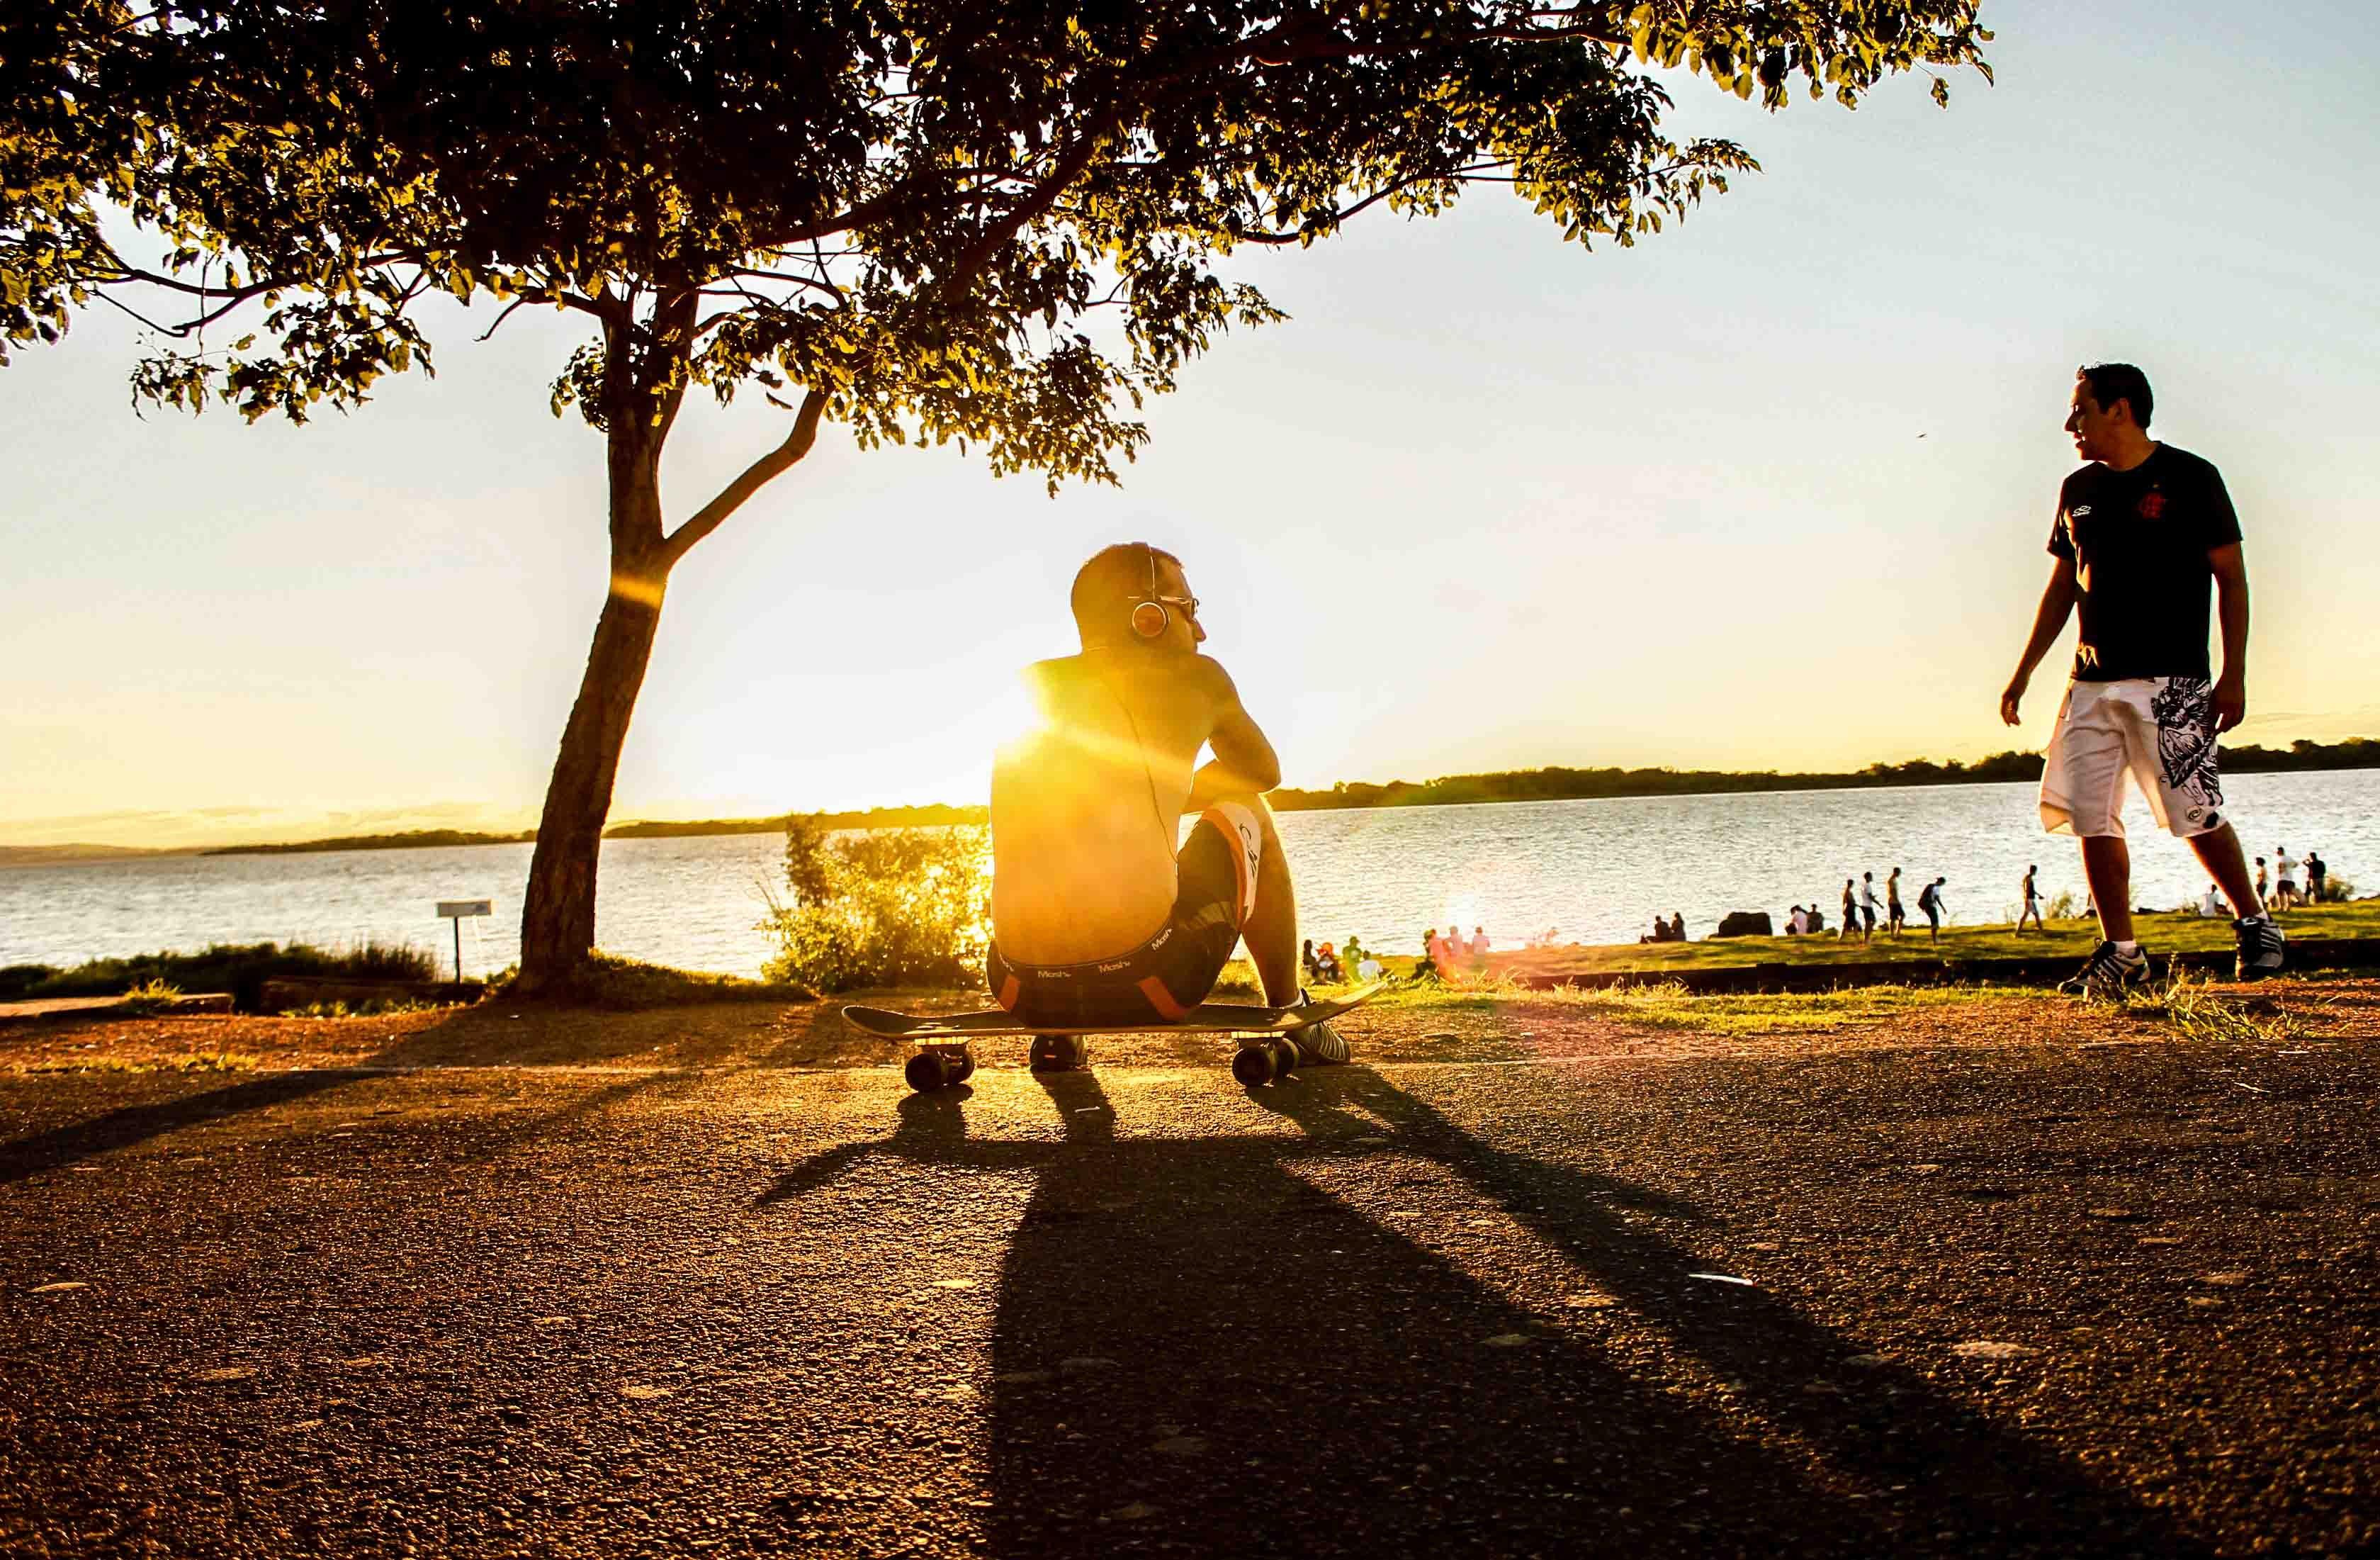 Photo of Man Sitting on Skateboard